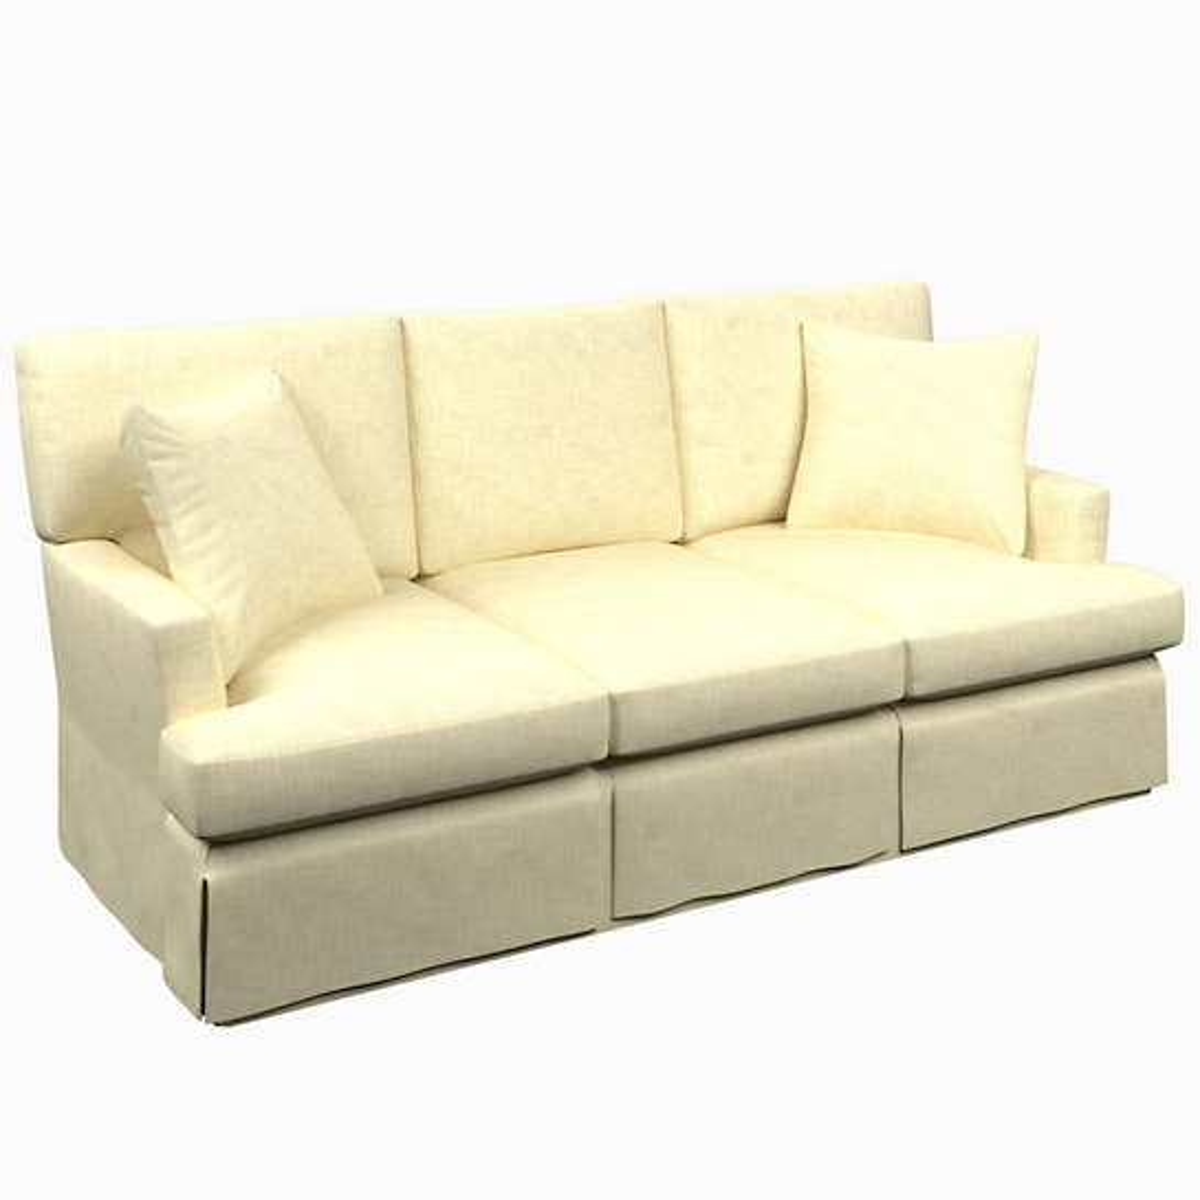 Greylock Ivory Saybrook 3 Seater Sofa